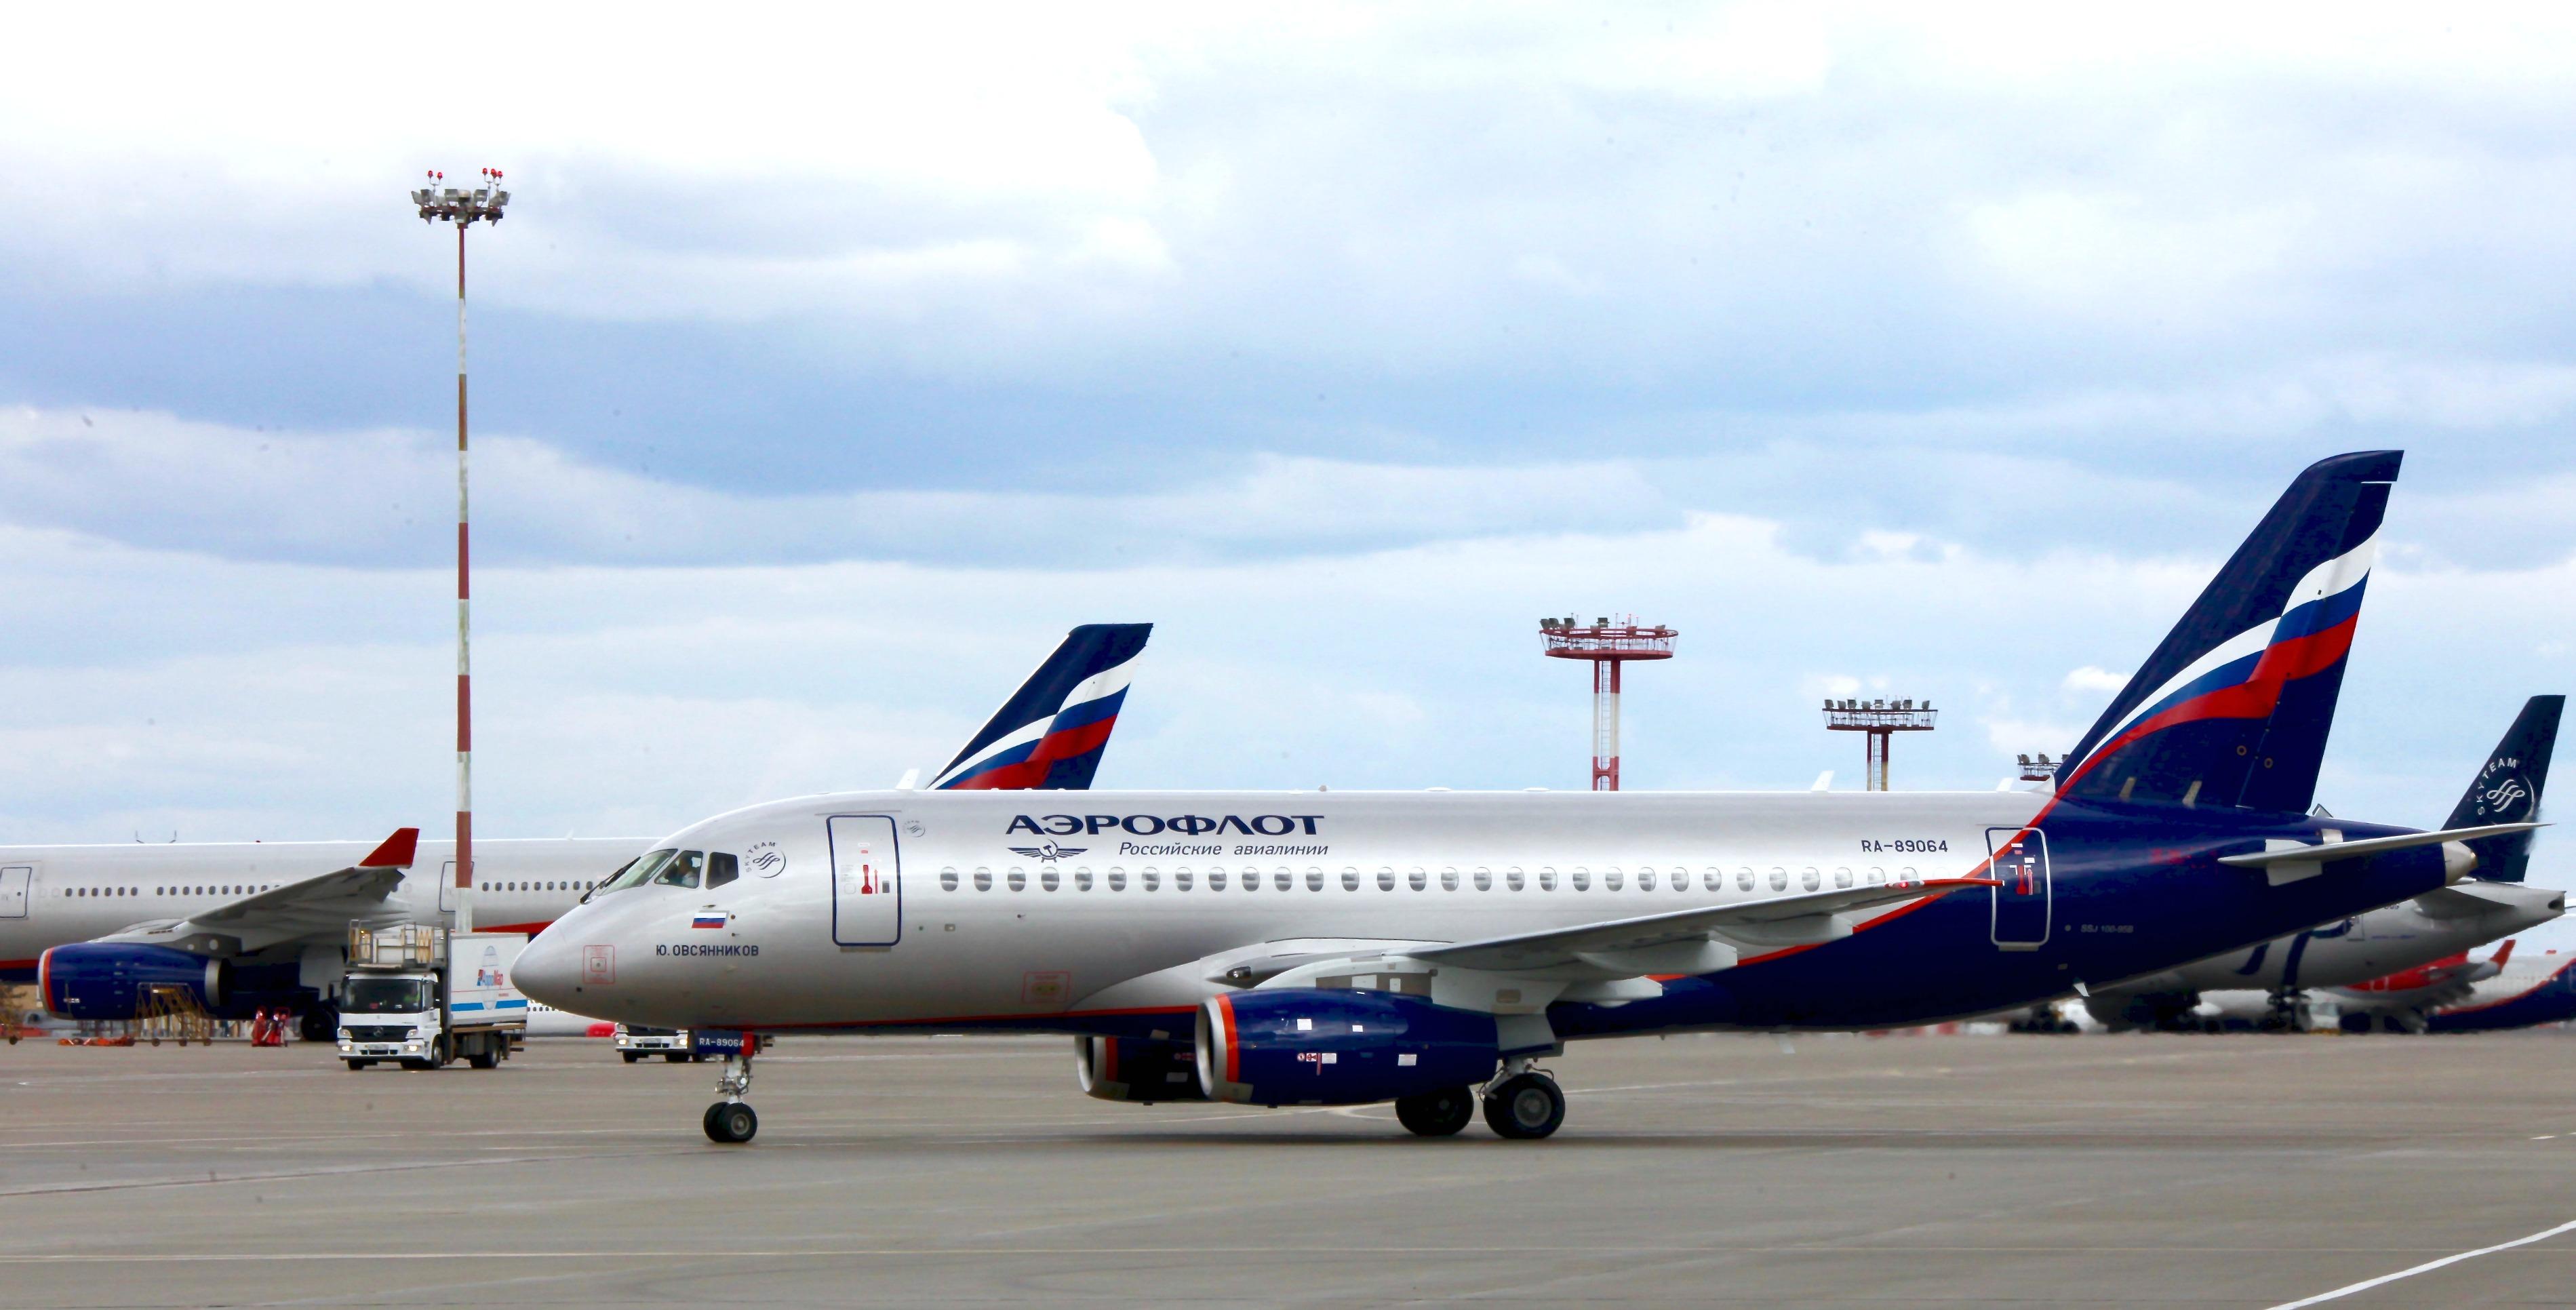 Aeroflot welcomes new Sukhoi Superjet 100 into its fleet